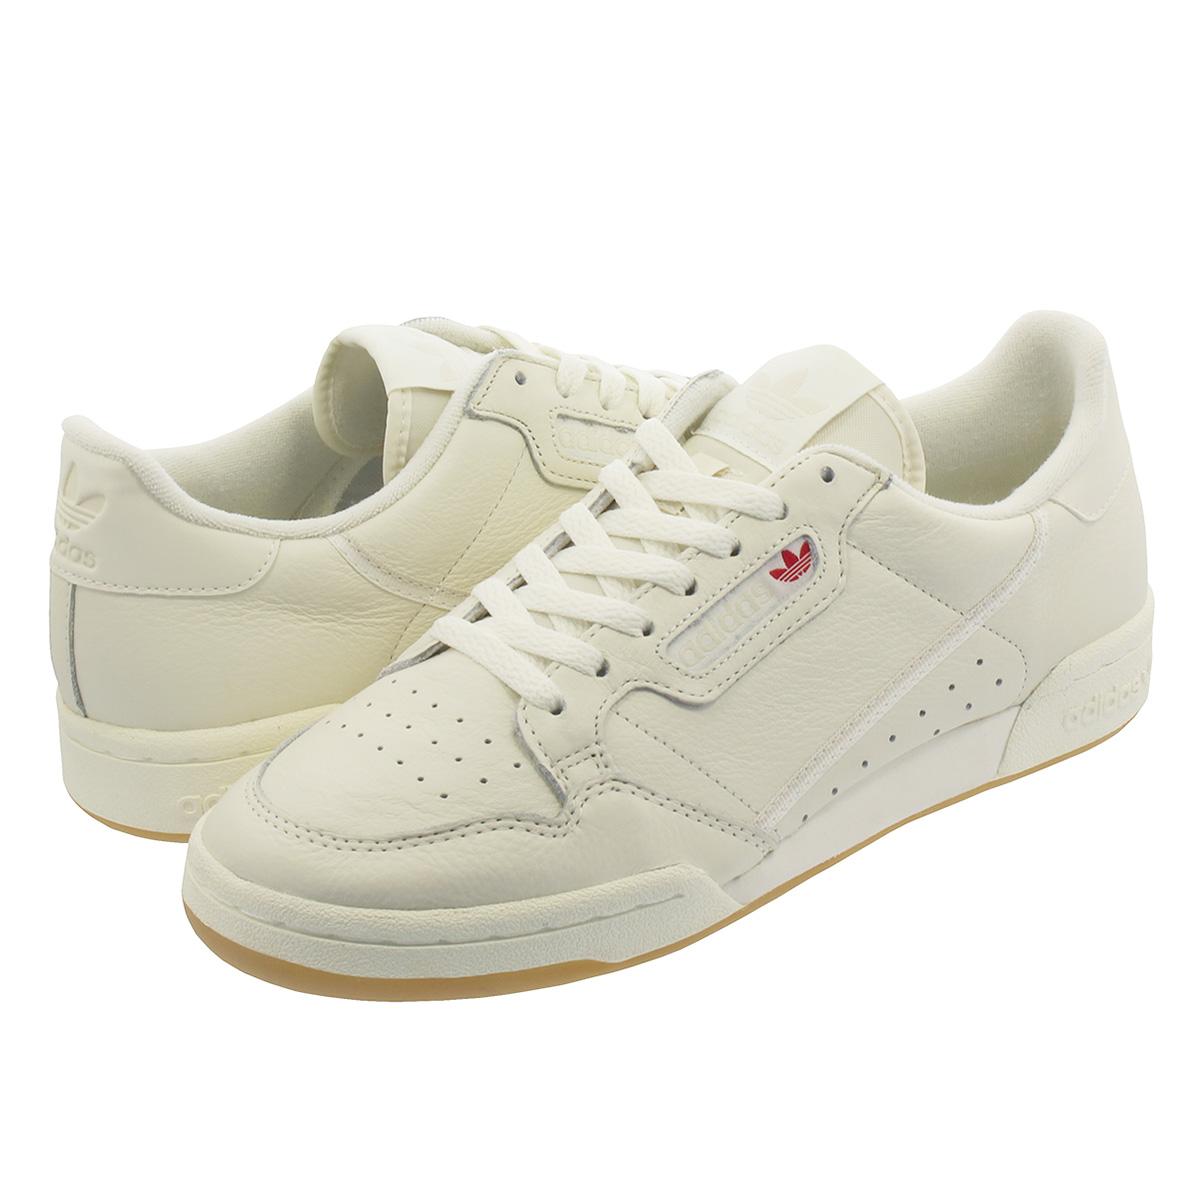 Adidas Continental 80 Off White Raw White Gum3 BD7975